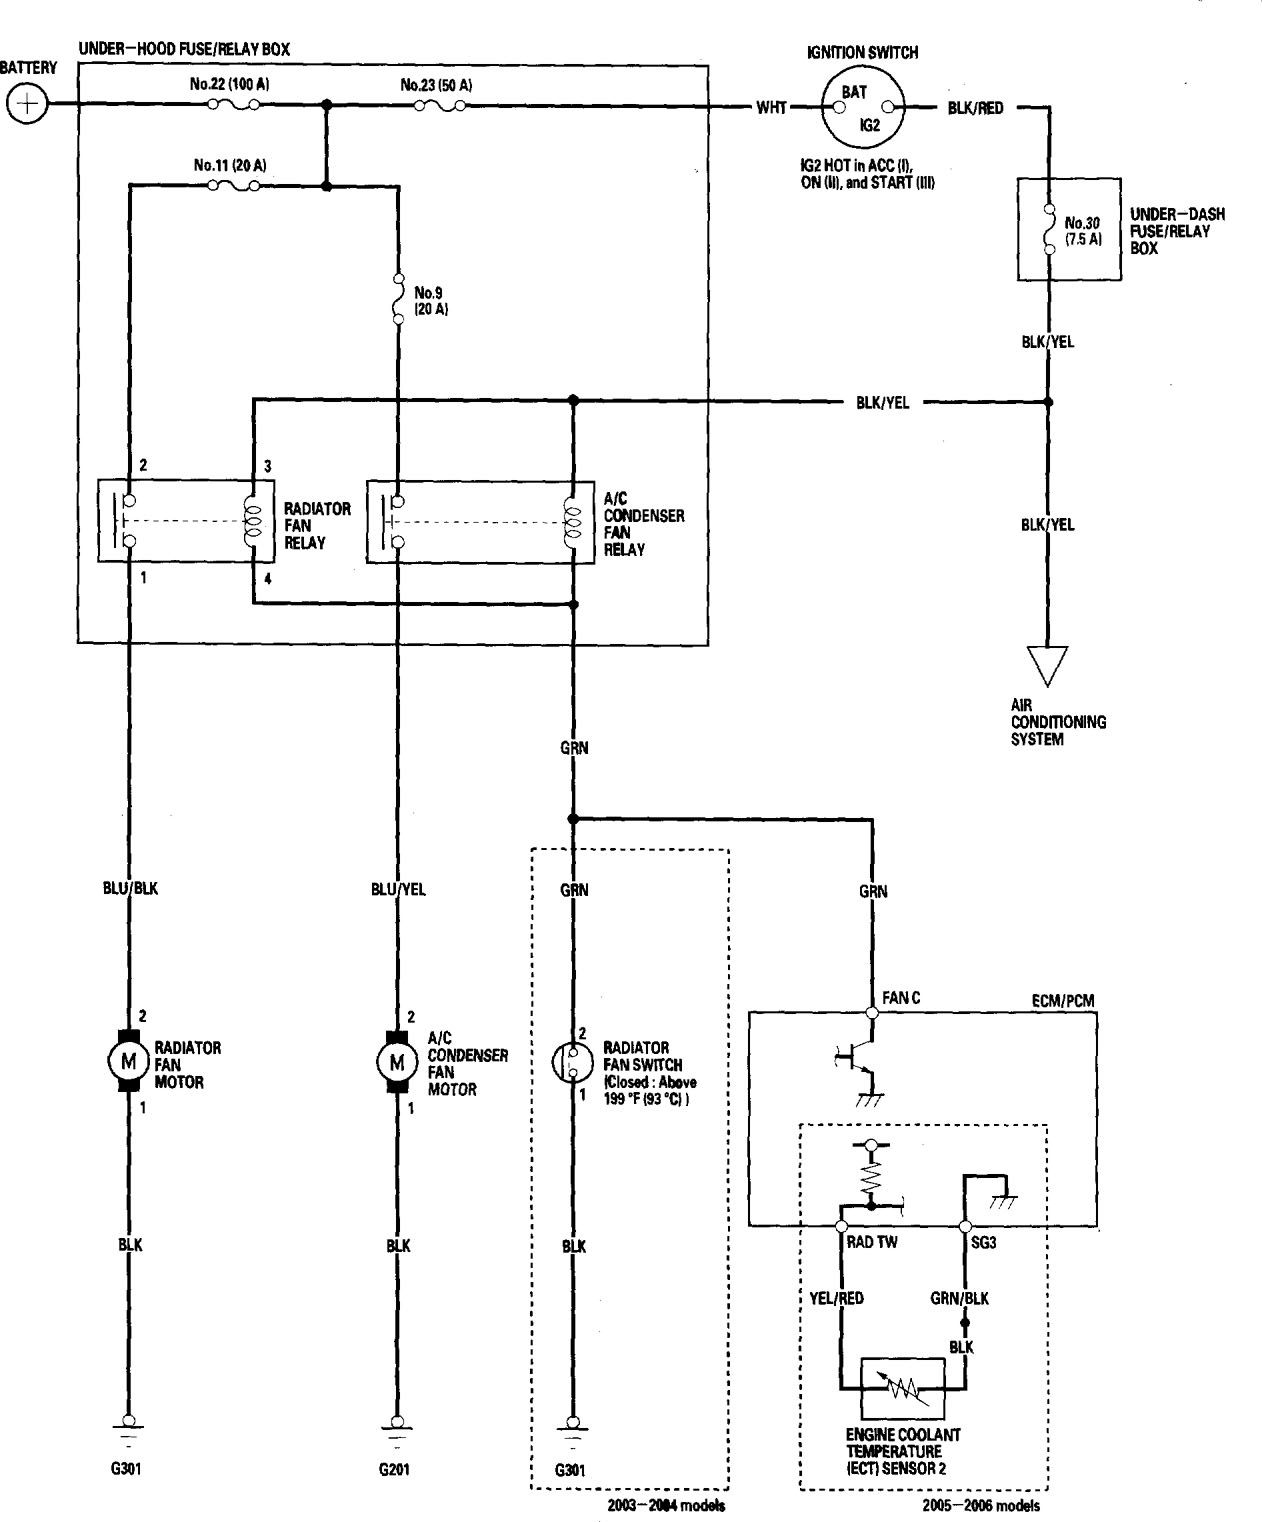 DIAGRAM] 1991 Honda Accord Fan Wiring Diagram FULL Version HD Quality Wiring  Diagram - CTIWIRING.CAMPUSTEMESA.IT  campustemesa.it